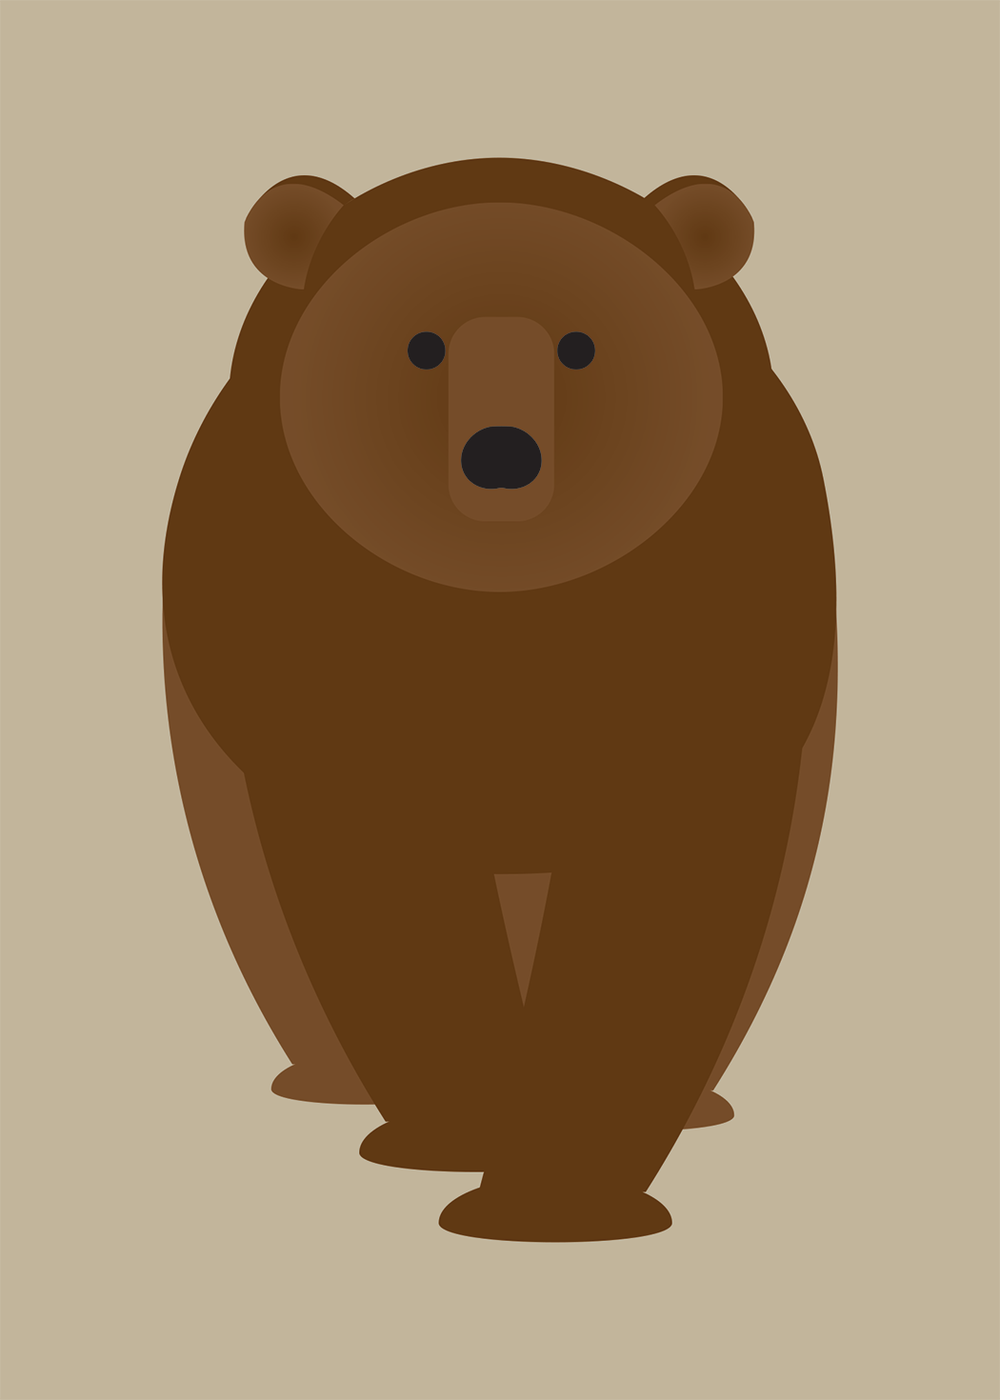 Armadillo, Brown Bear, Opossum, Raccoon Collection